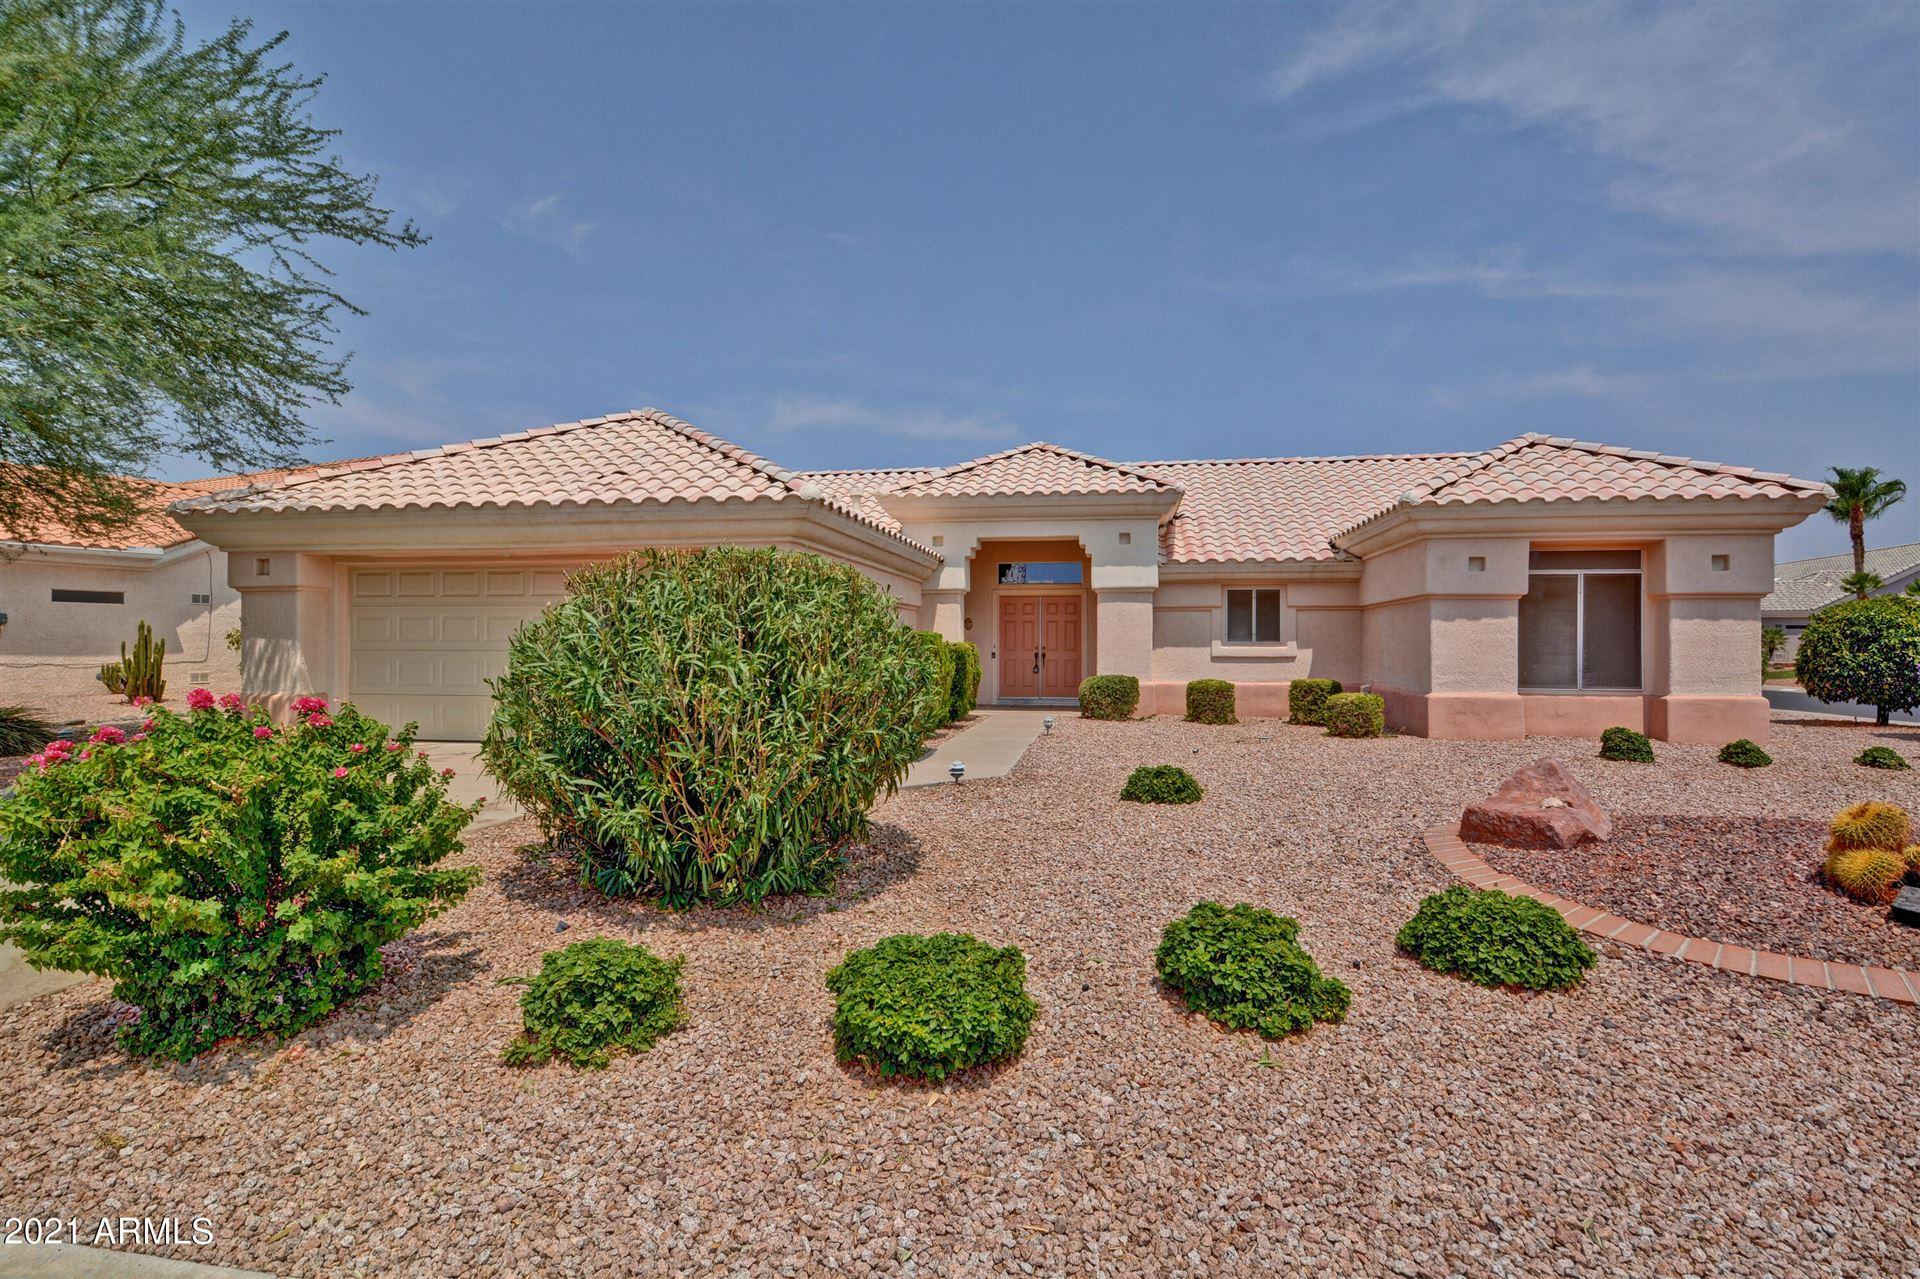 Photo of 14612 W DOMINGO Lane, Sun City West, AZ 85375 (MLS # 6268864)